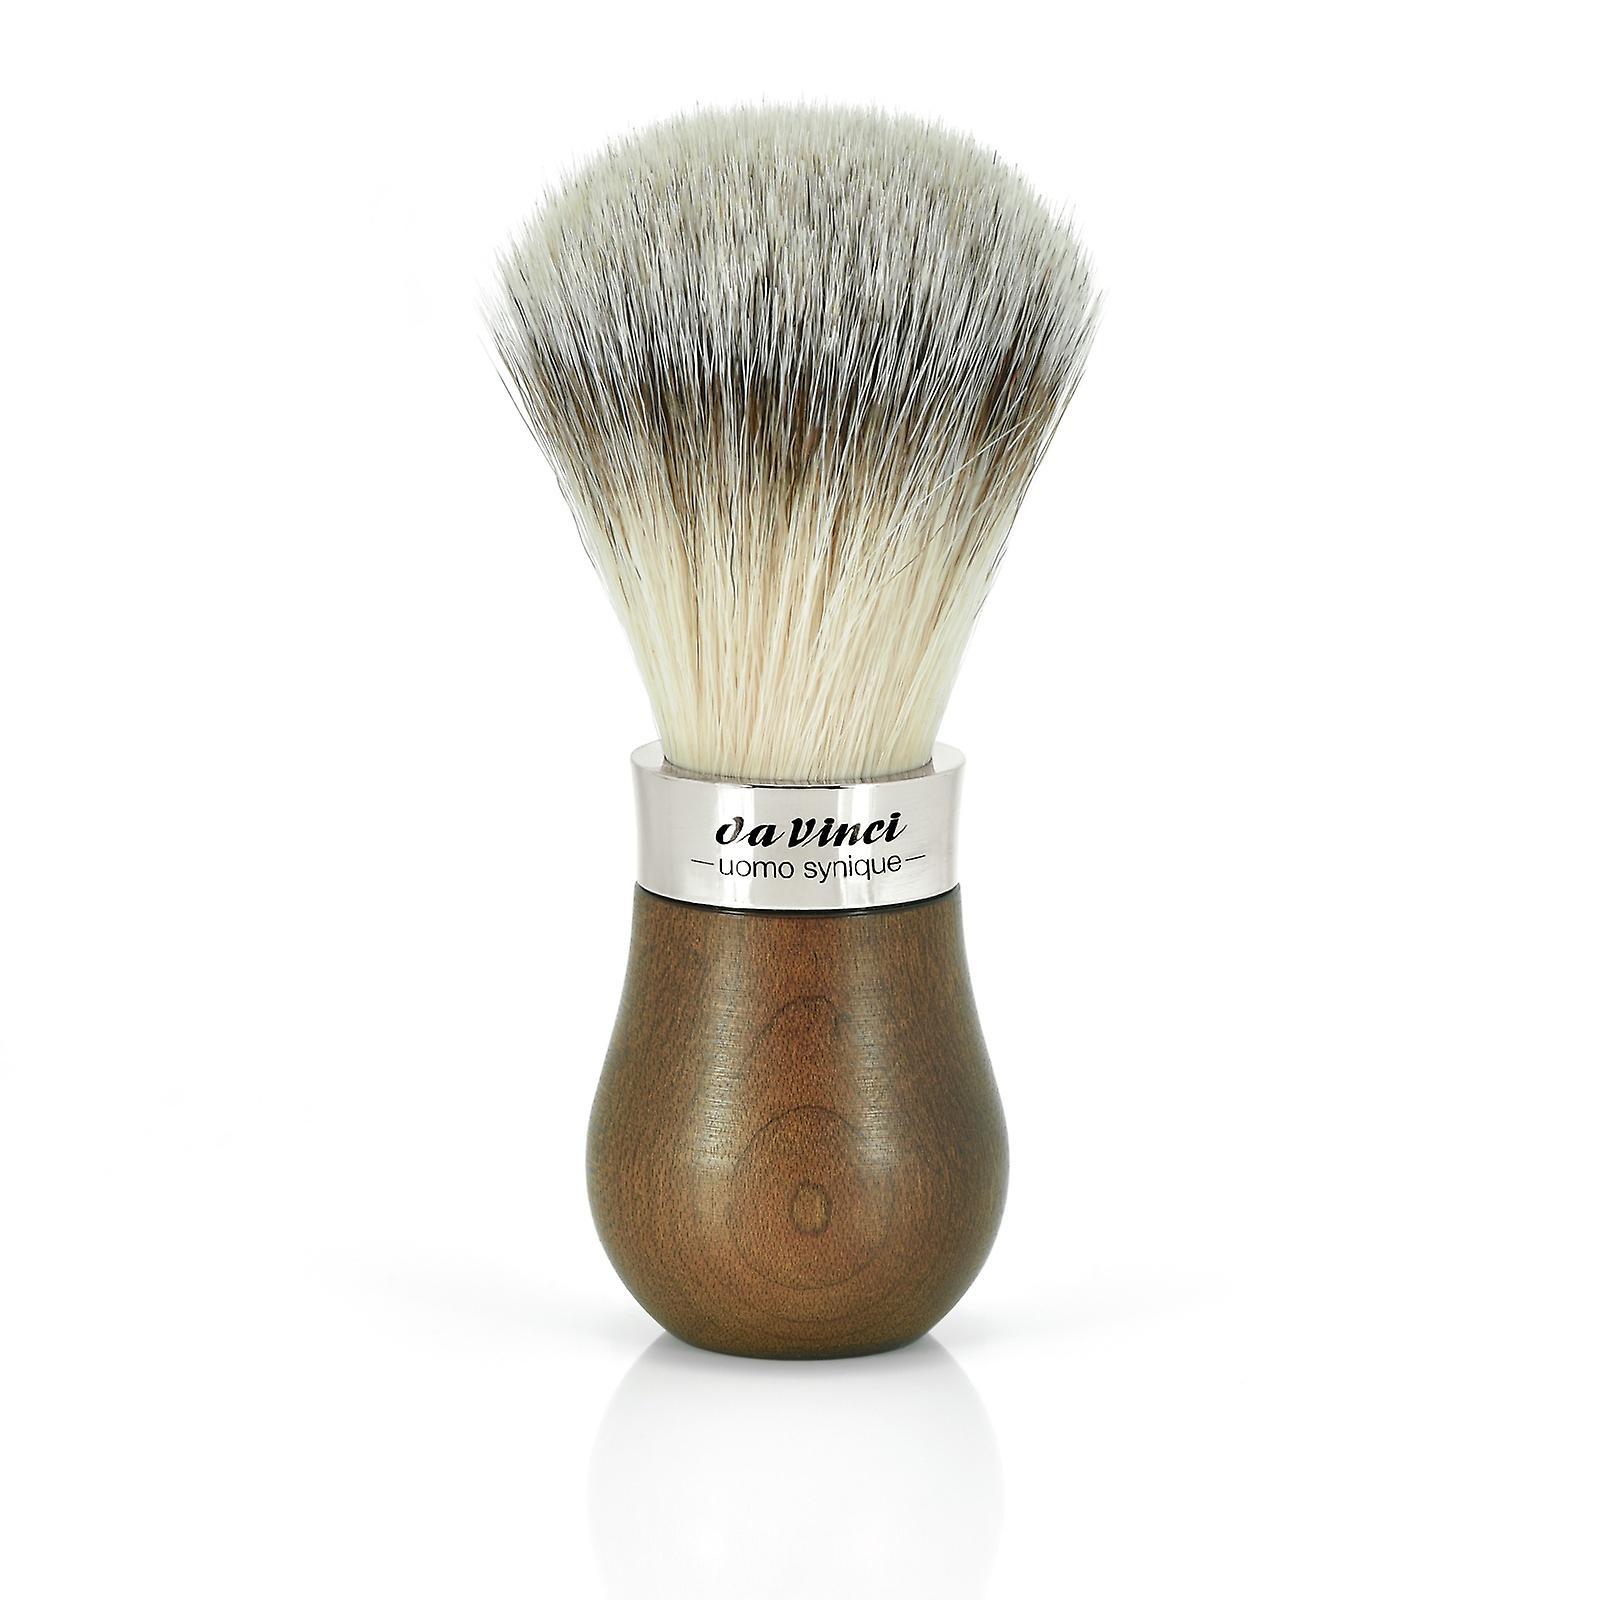 Da Vinci UOMO SYNIQUE 279 Shaving Brush | ø22mm